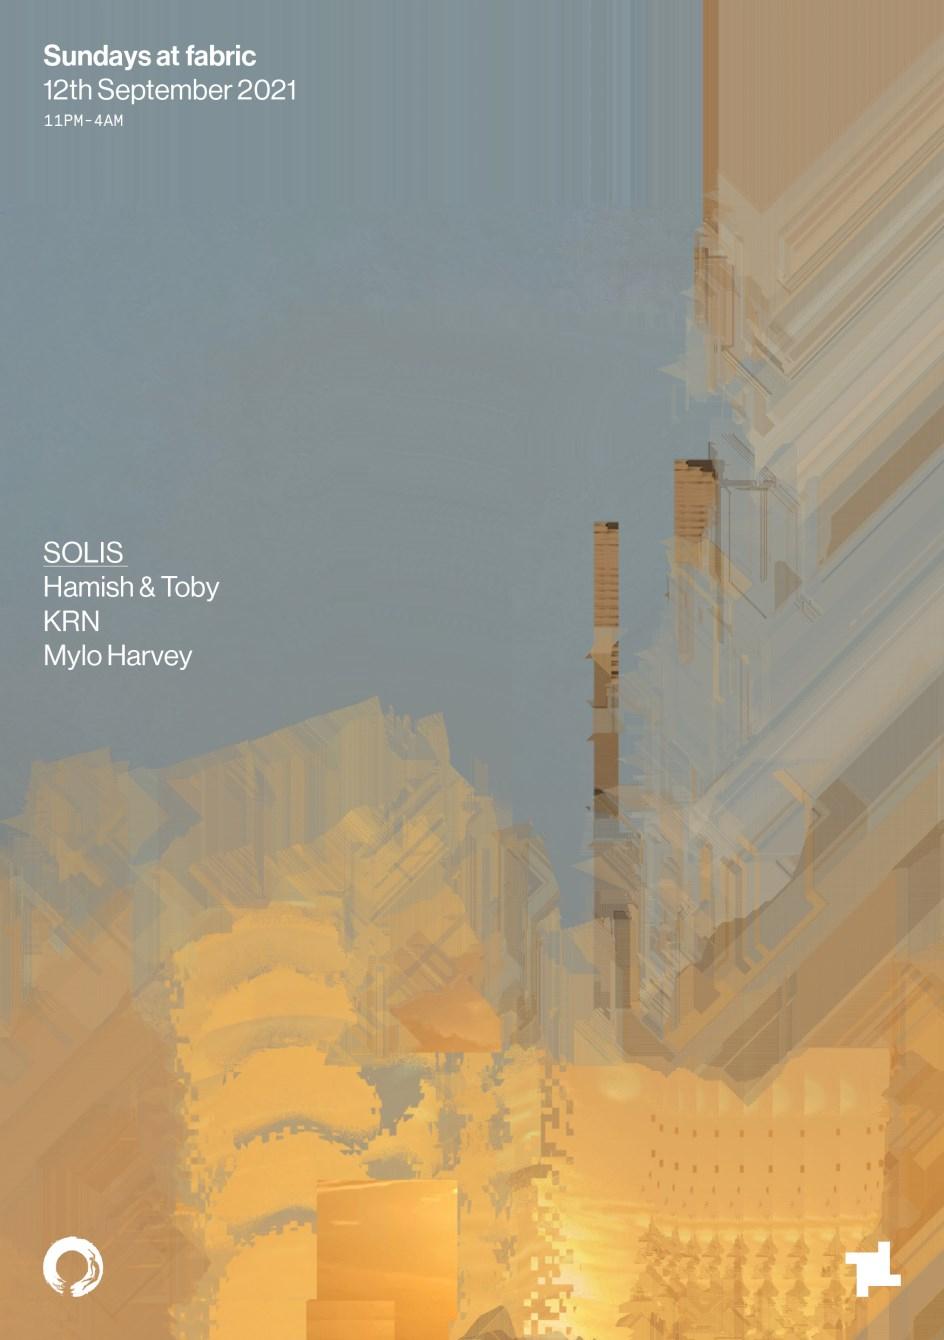 Sundays at fabric: SOLIS - Hamish & Toby, KRN, Mylo Harvey - Flyer front